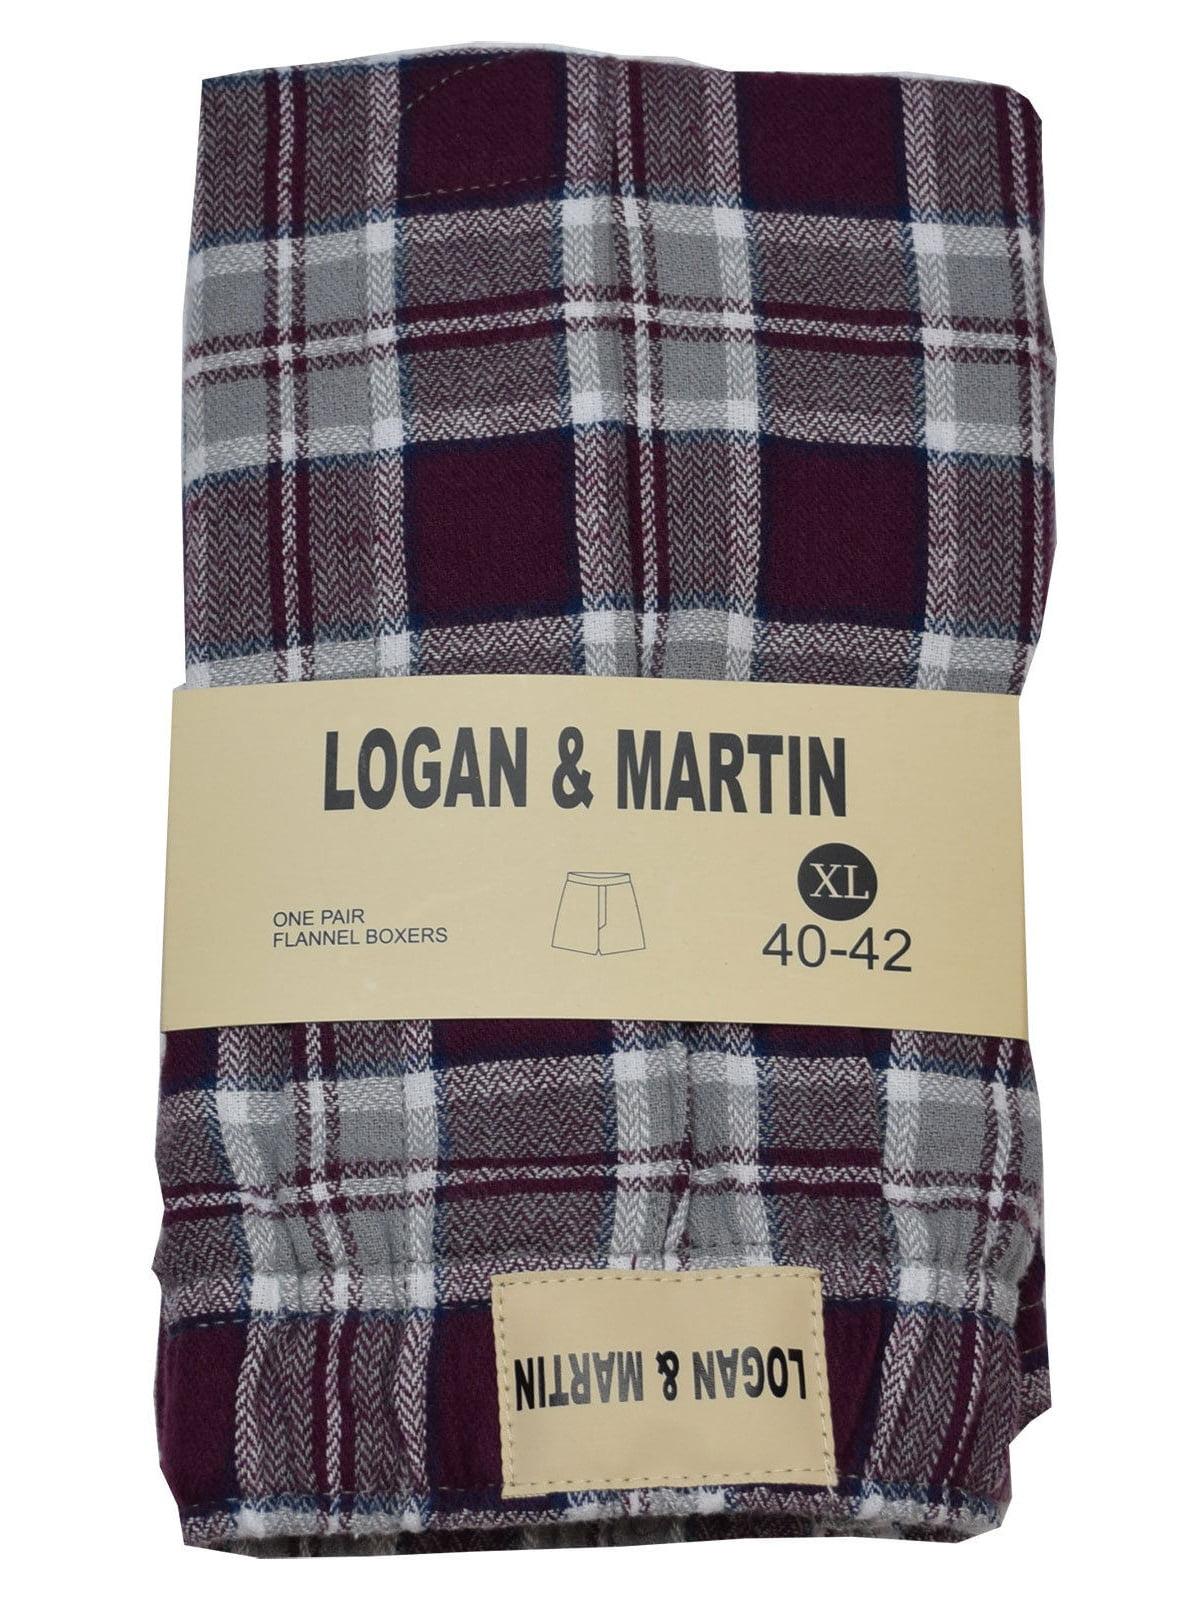 LOGAN & MARTIN MEN'S 100% Cotton FLANNEL BOXERS IN 10 COLORS/STYLES SIZES 40-46